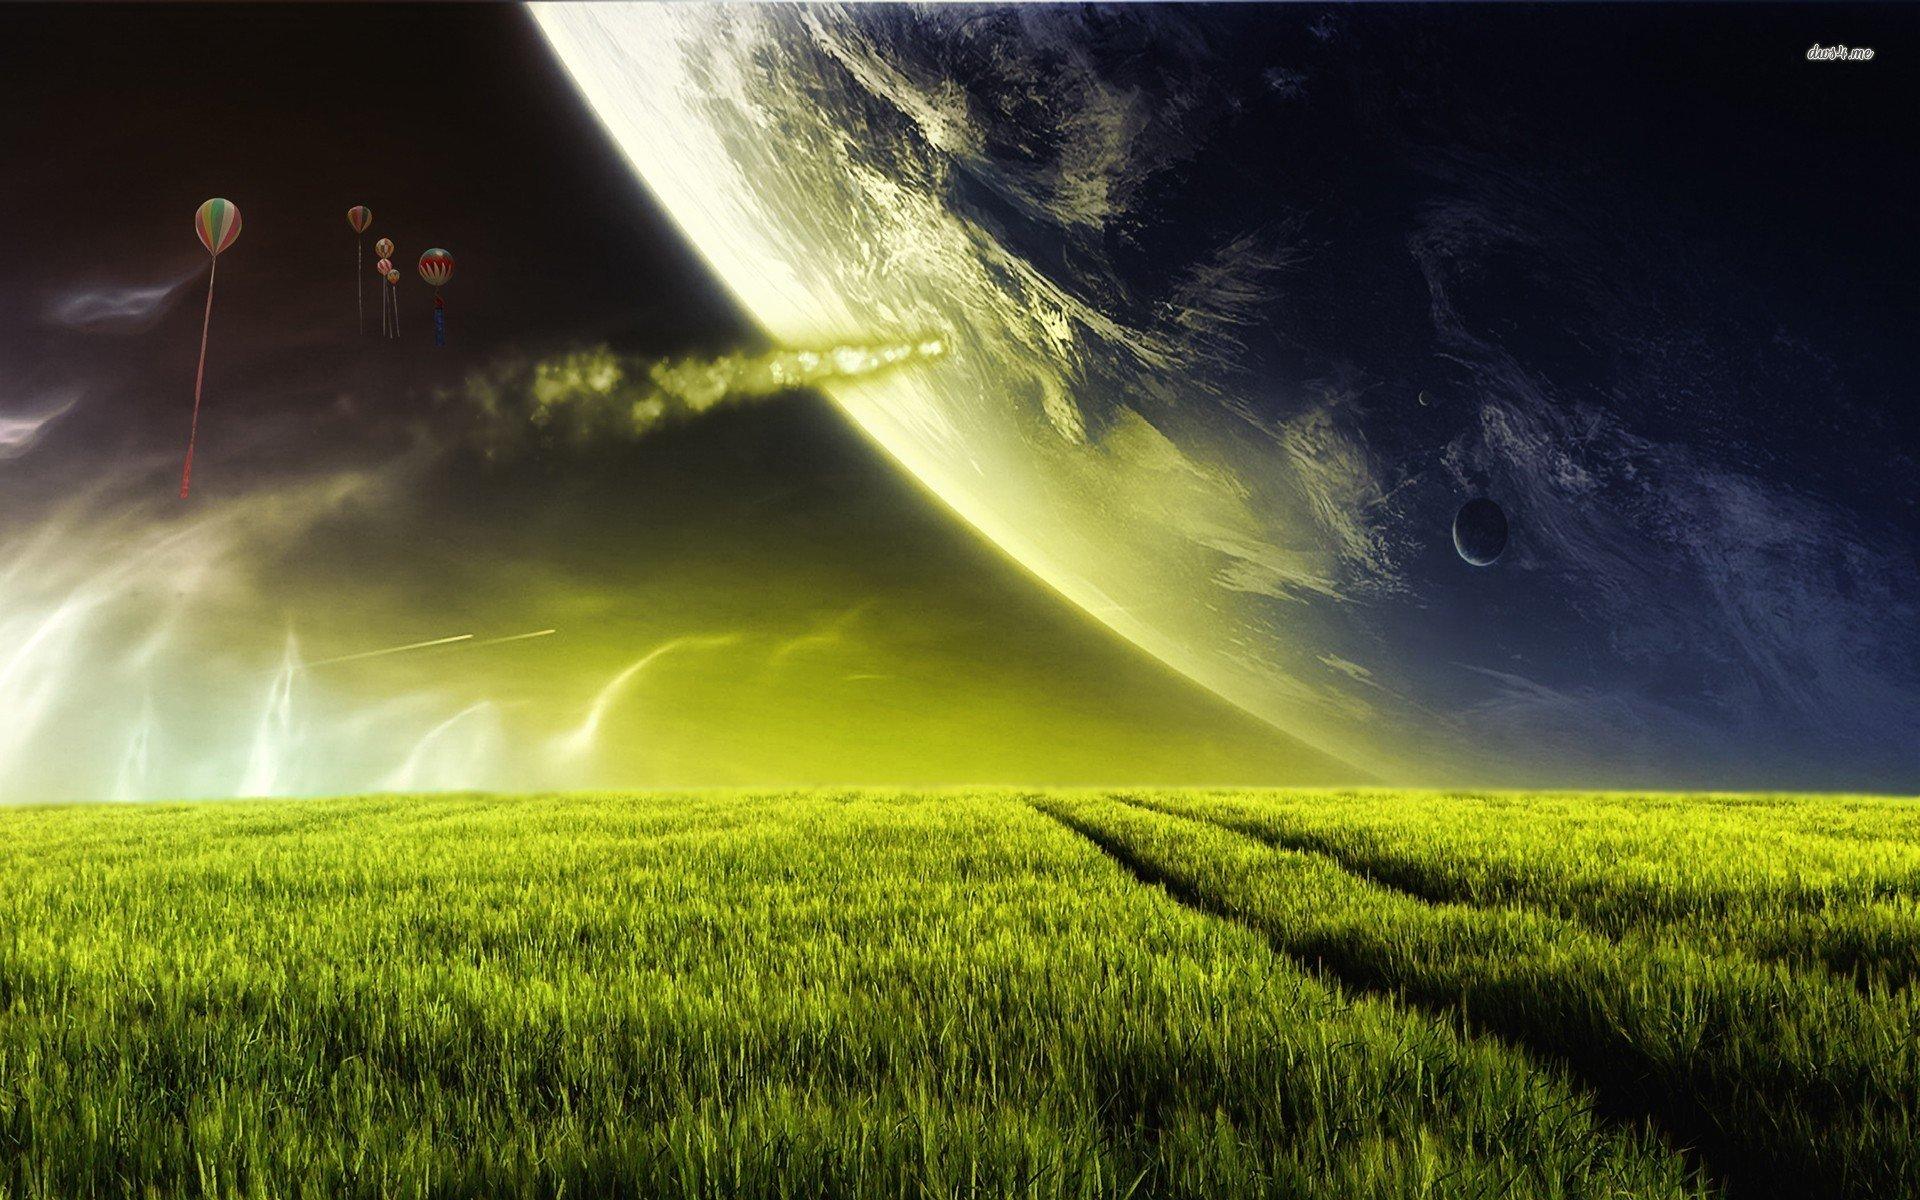 Alien Planet Wallpaper High Definition 14967 - Amazing Wallpaperz